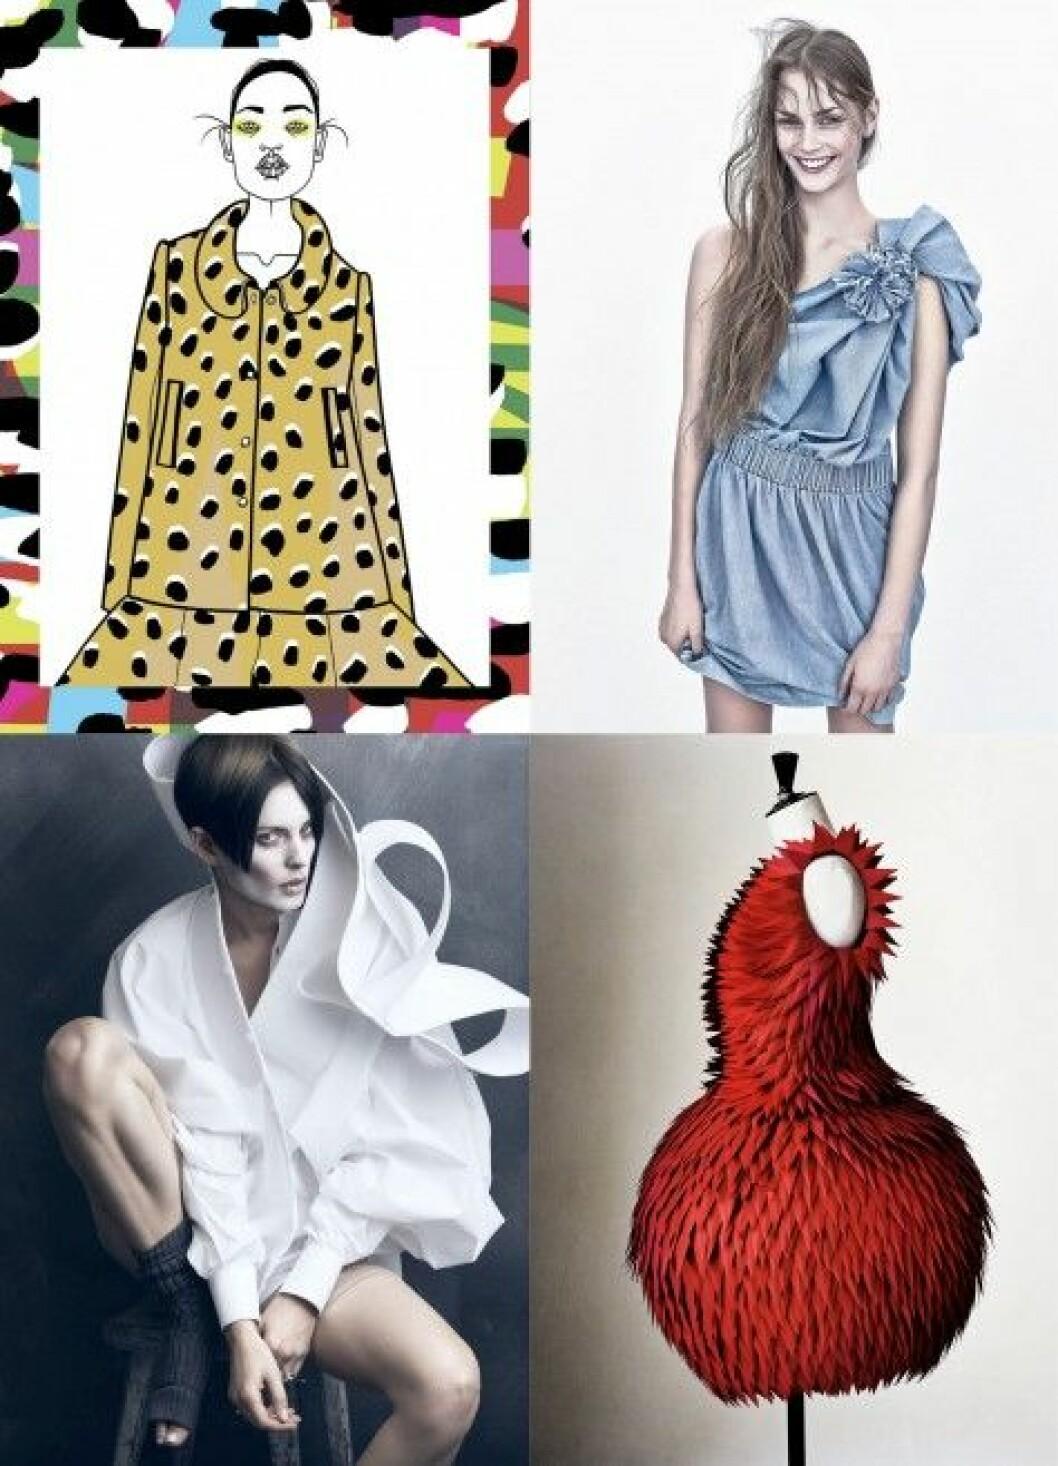 svenskt_mode_bilder